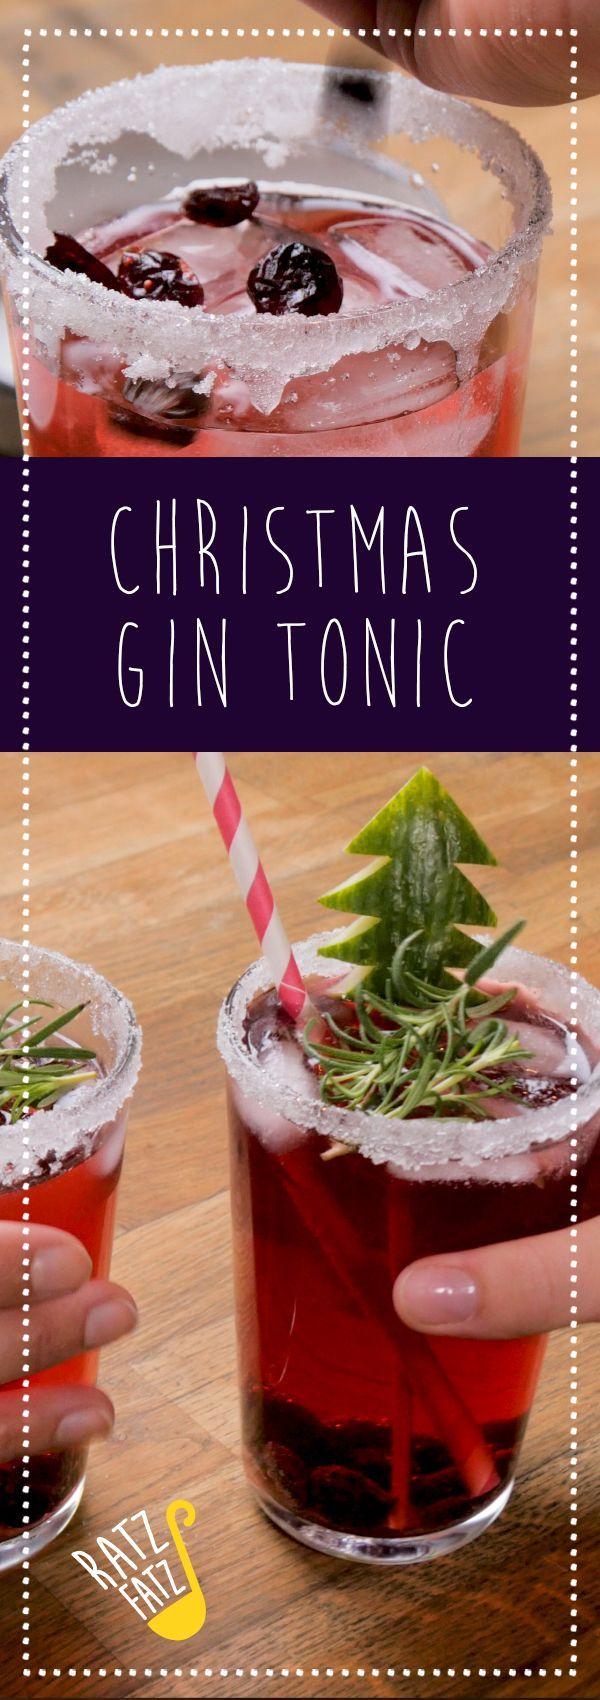 Ratz Fatz: Christmas Gin Tonic